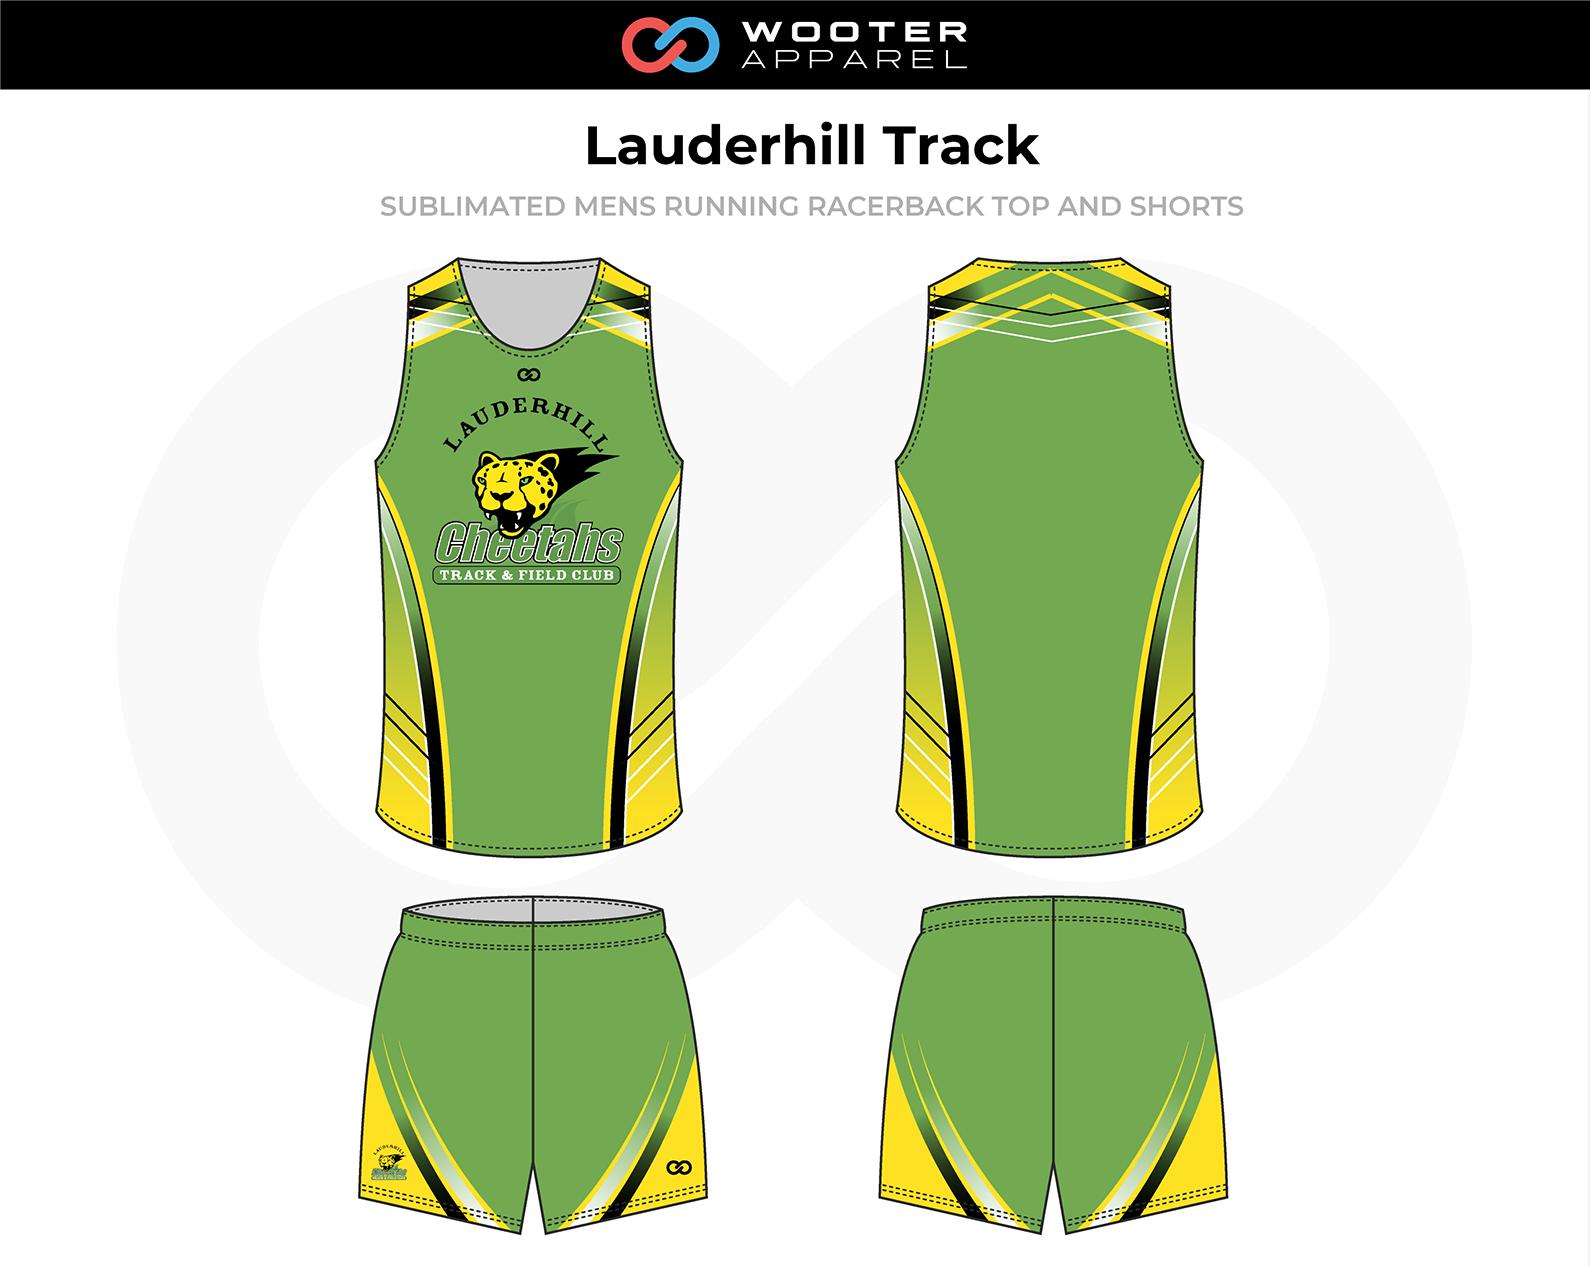 2018-11-02 Lauderhill Track Uniform B.png